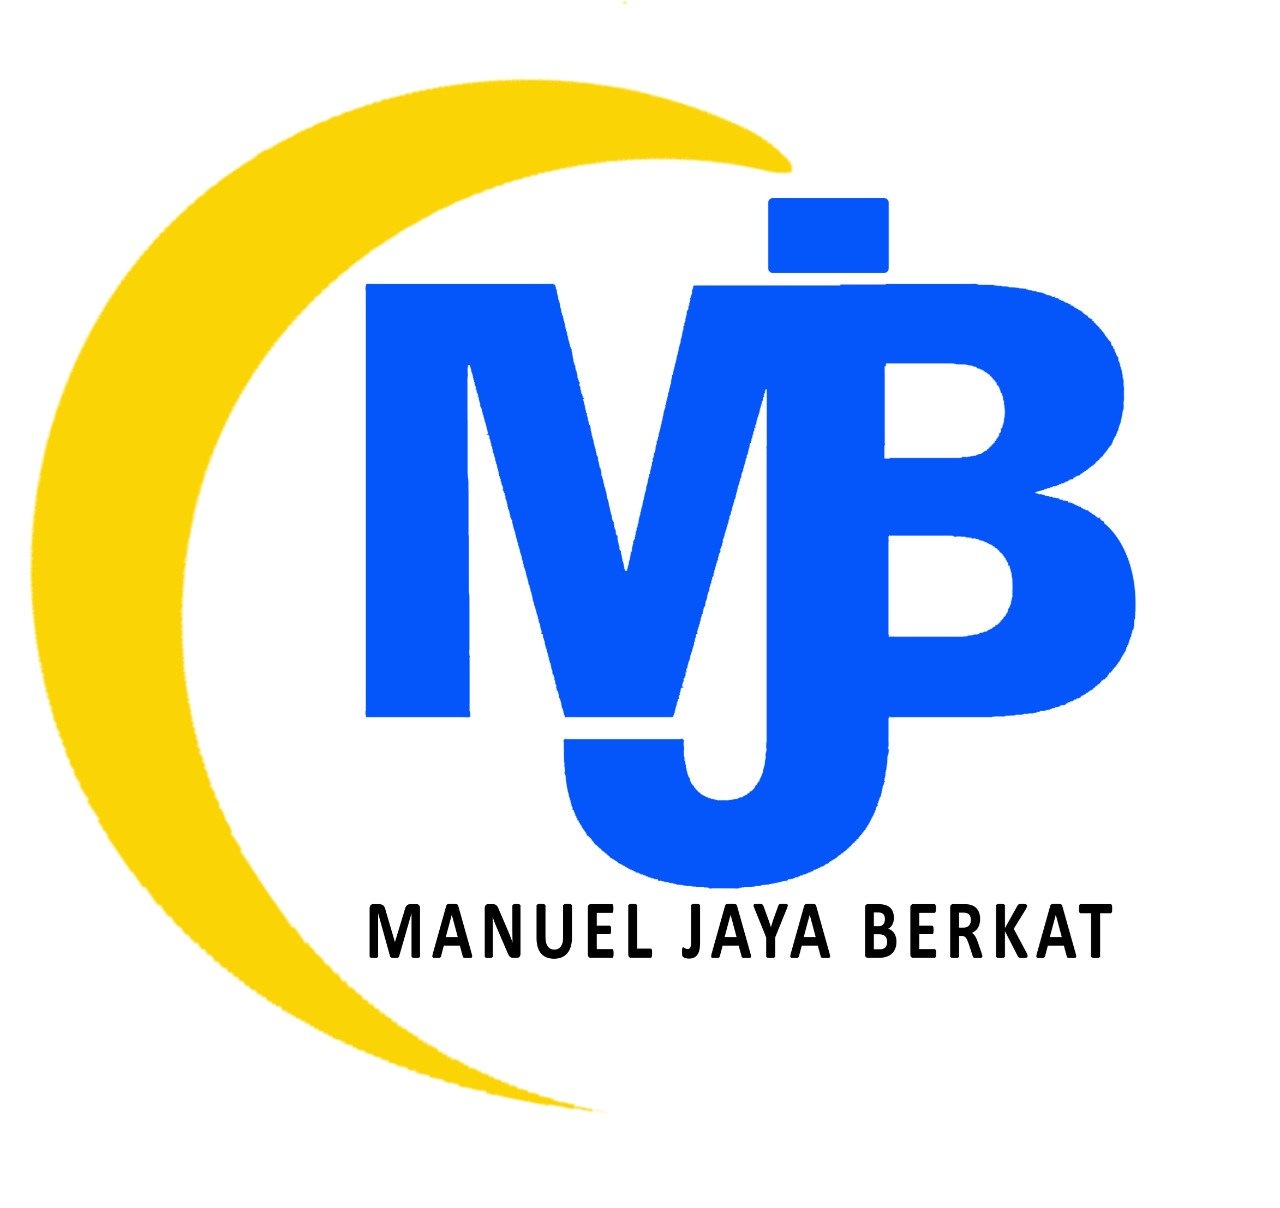 Logo Toko Manuel Jaya Berkat